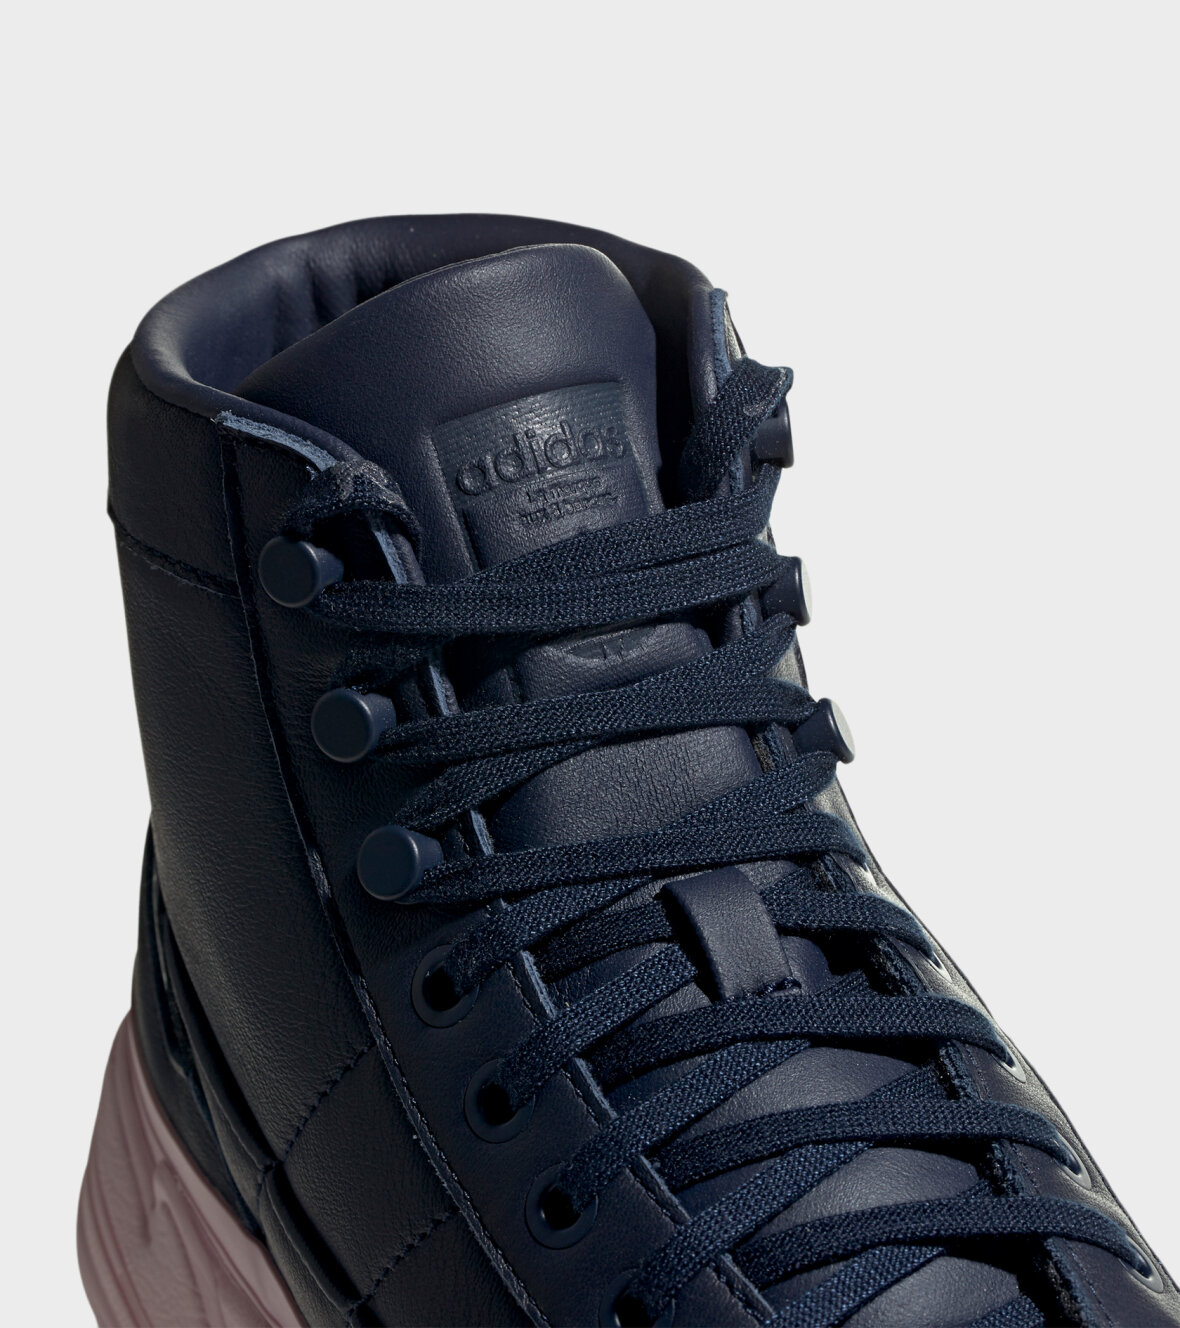 adidas Kiellor Xtra Sneaker Boot   Sneaker boots, Sneakers